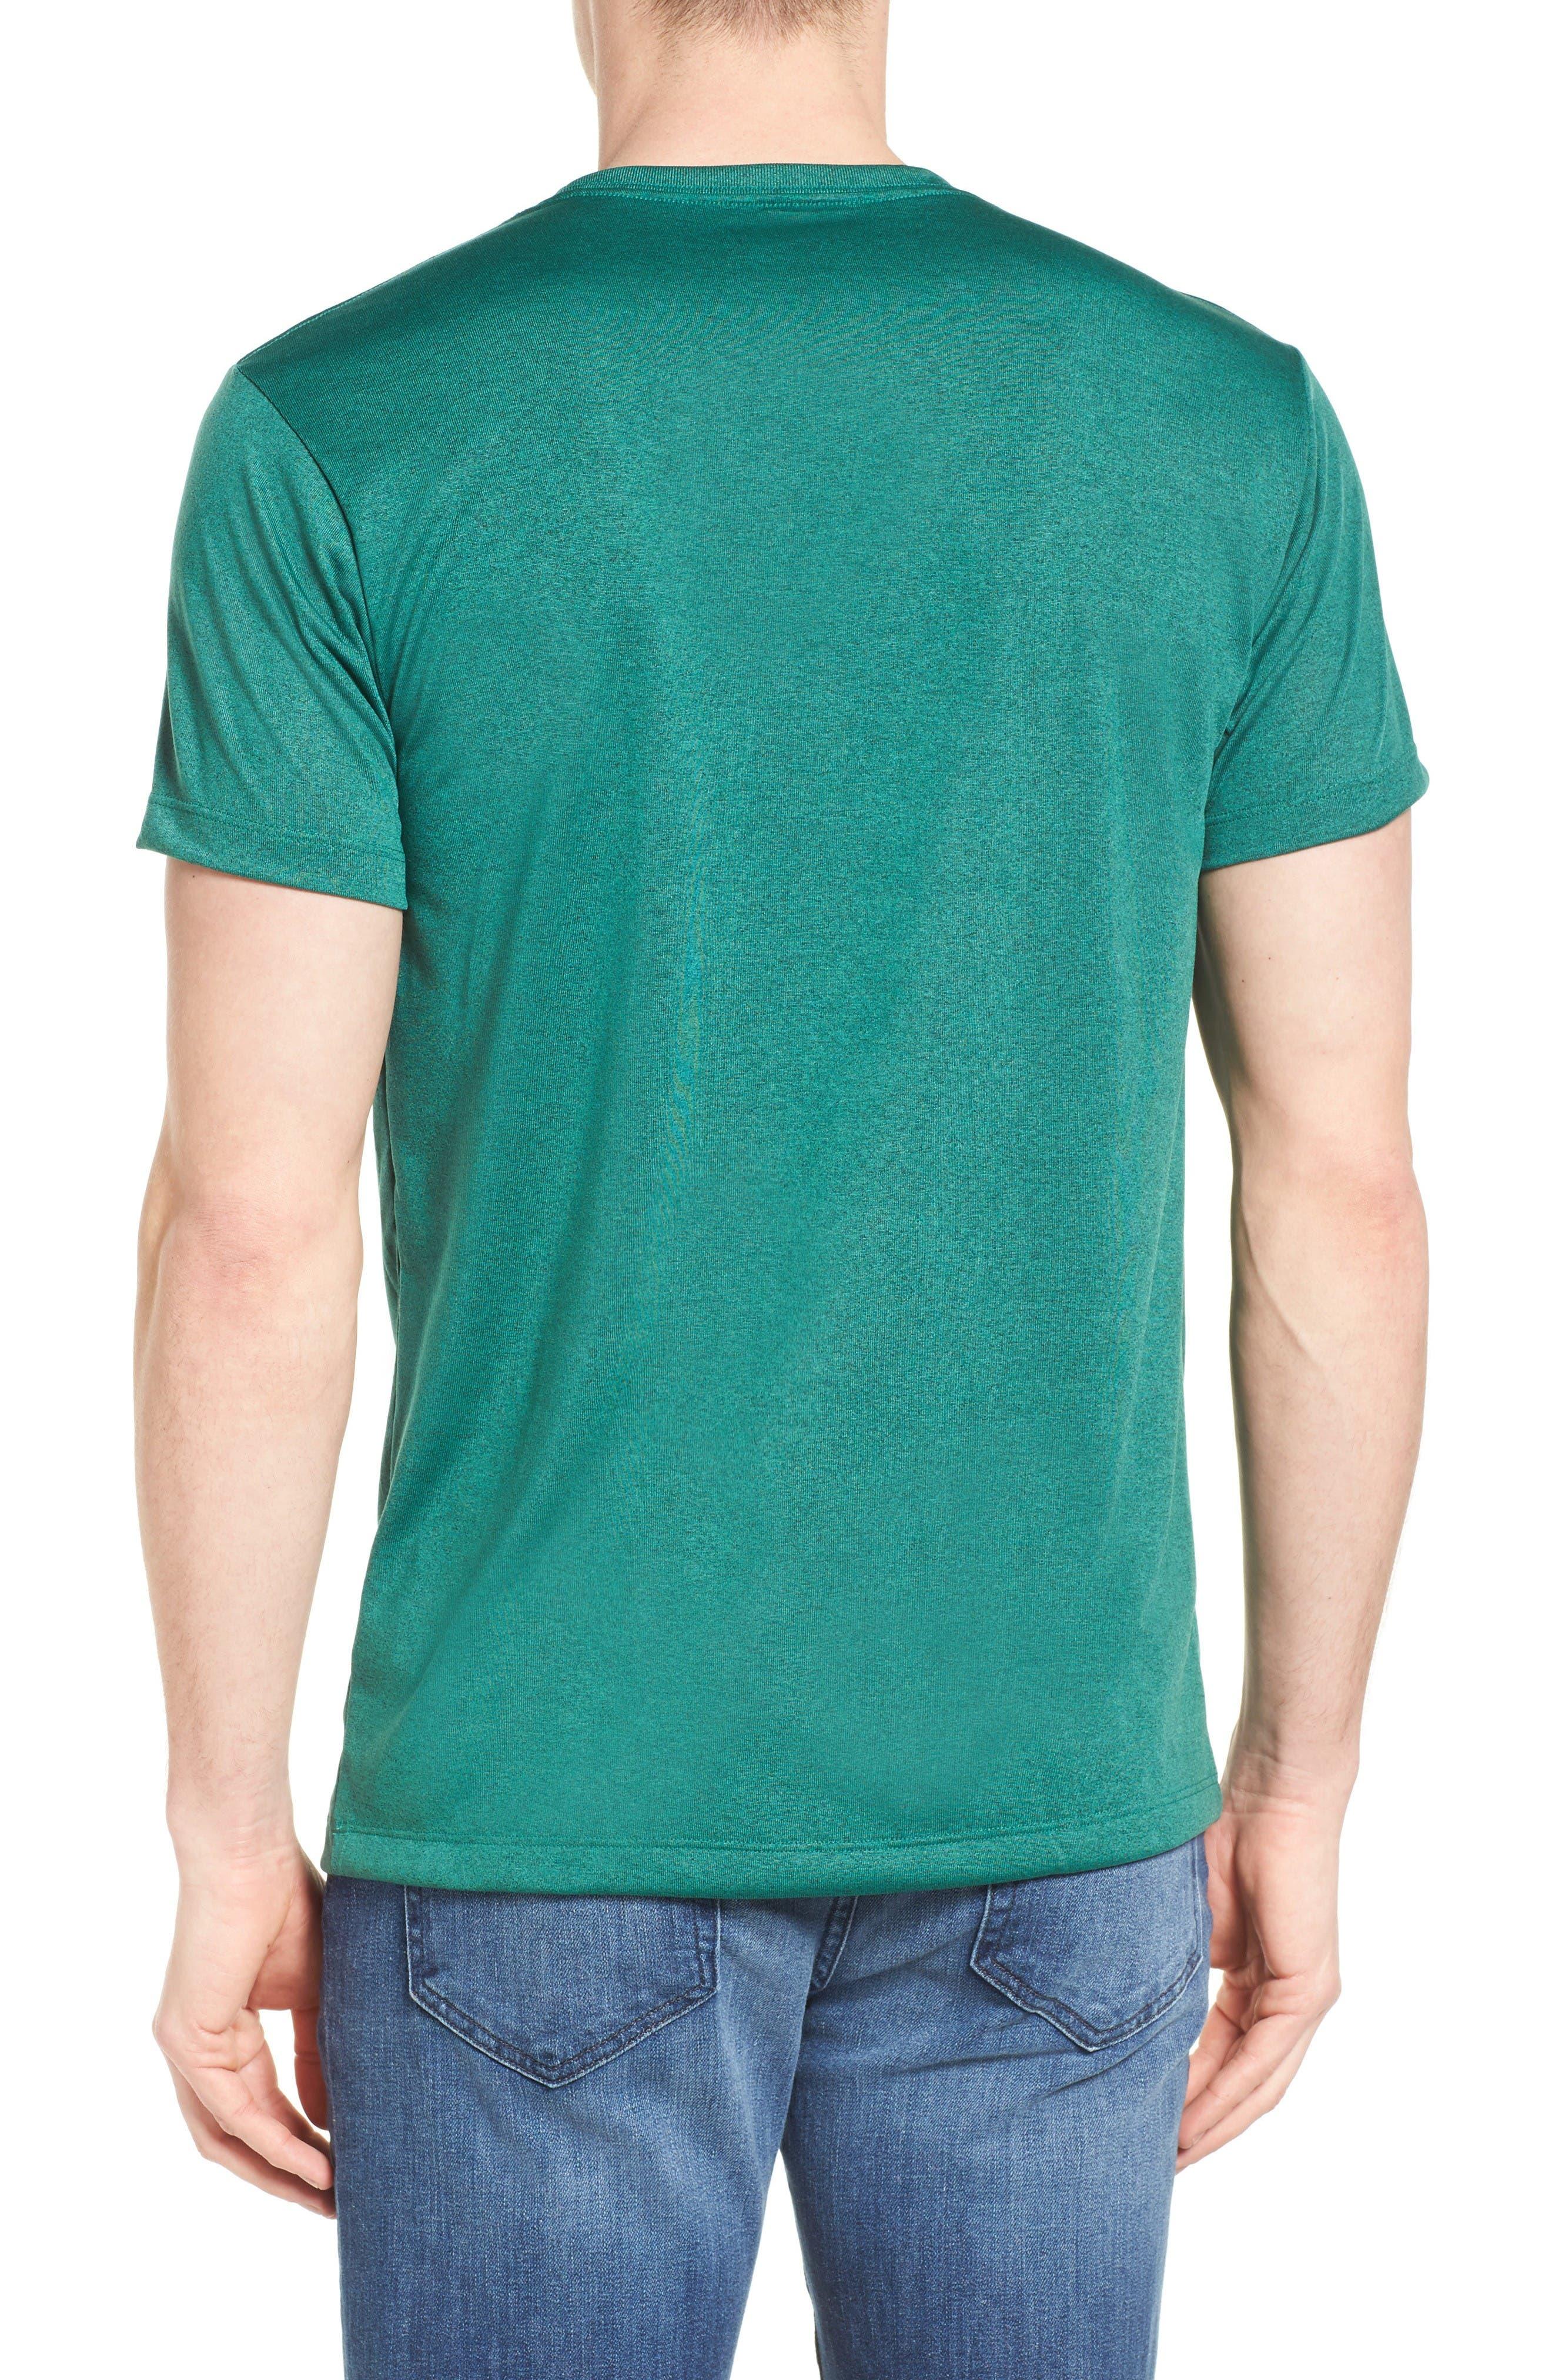 '73 Logo Slim Fit T-Shirt,                             Alternate thumbnail 2, color,                             Gem Green